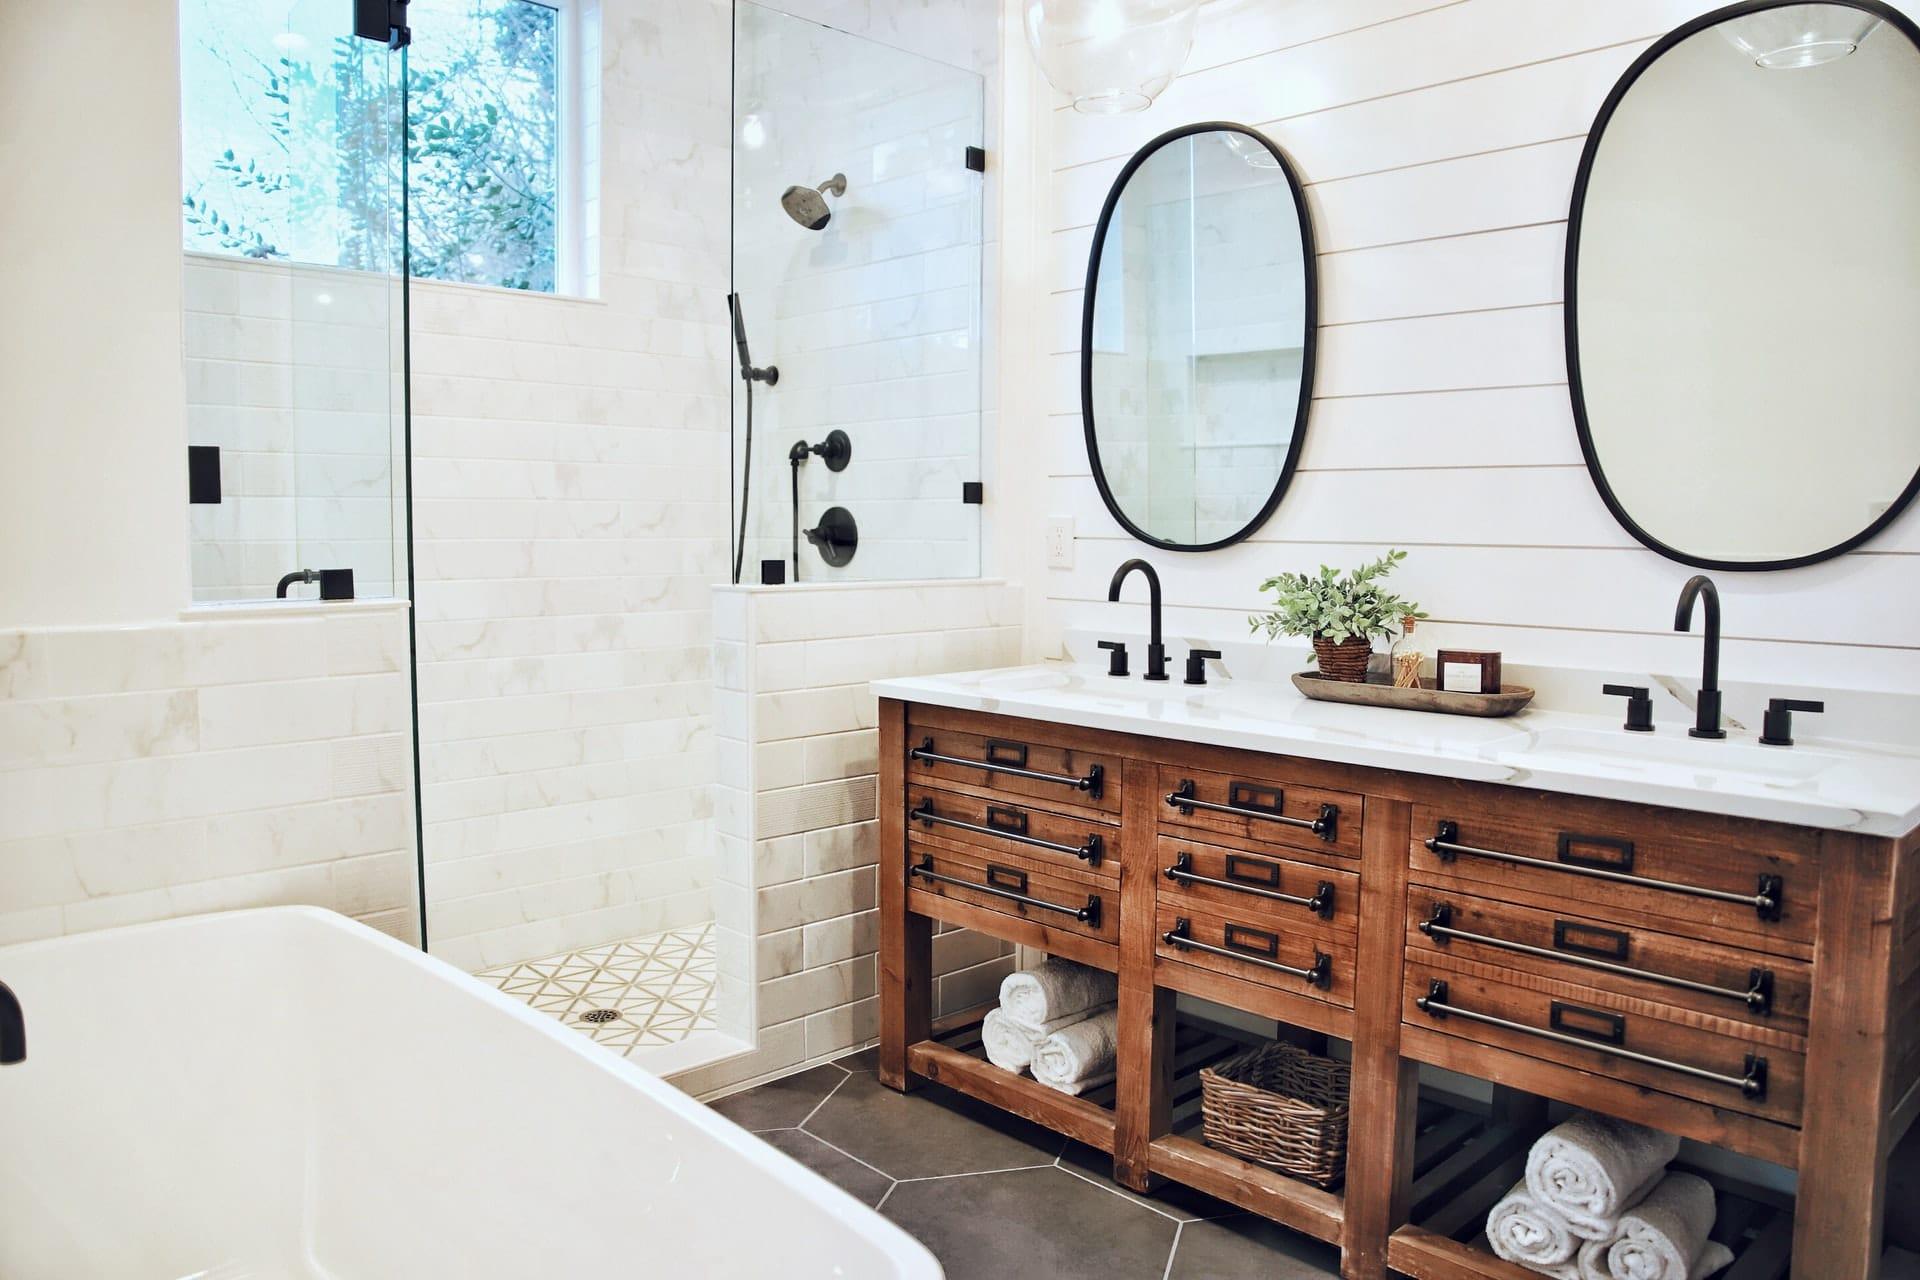 Farmhouse Bathroom Ideas - Featured